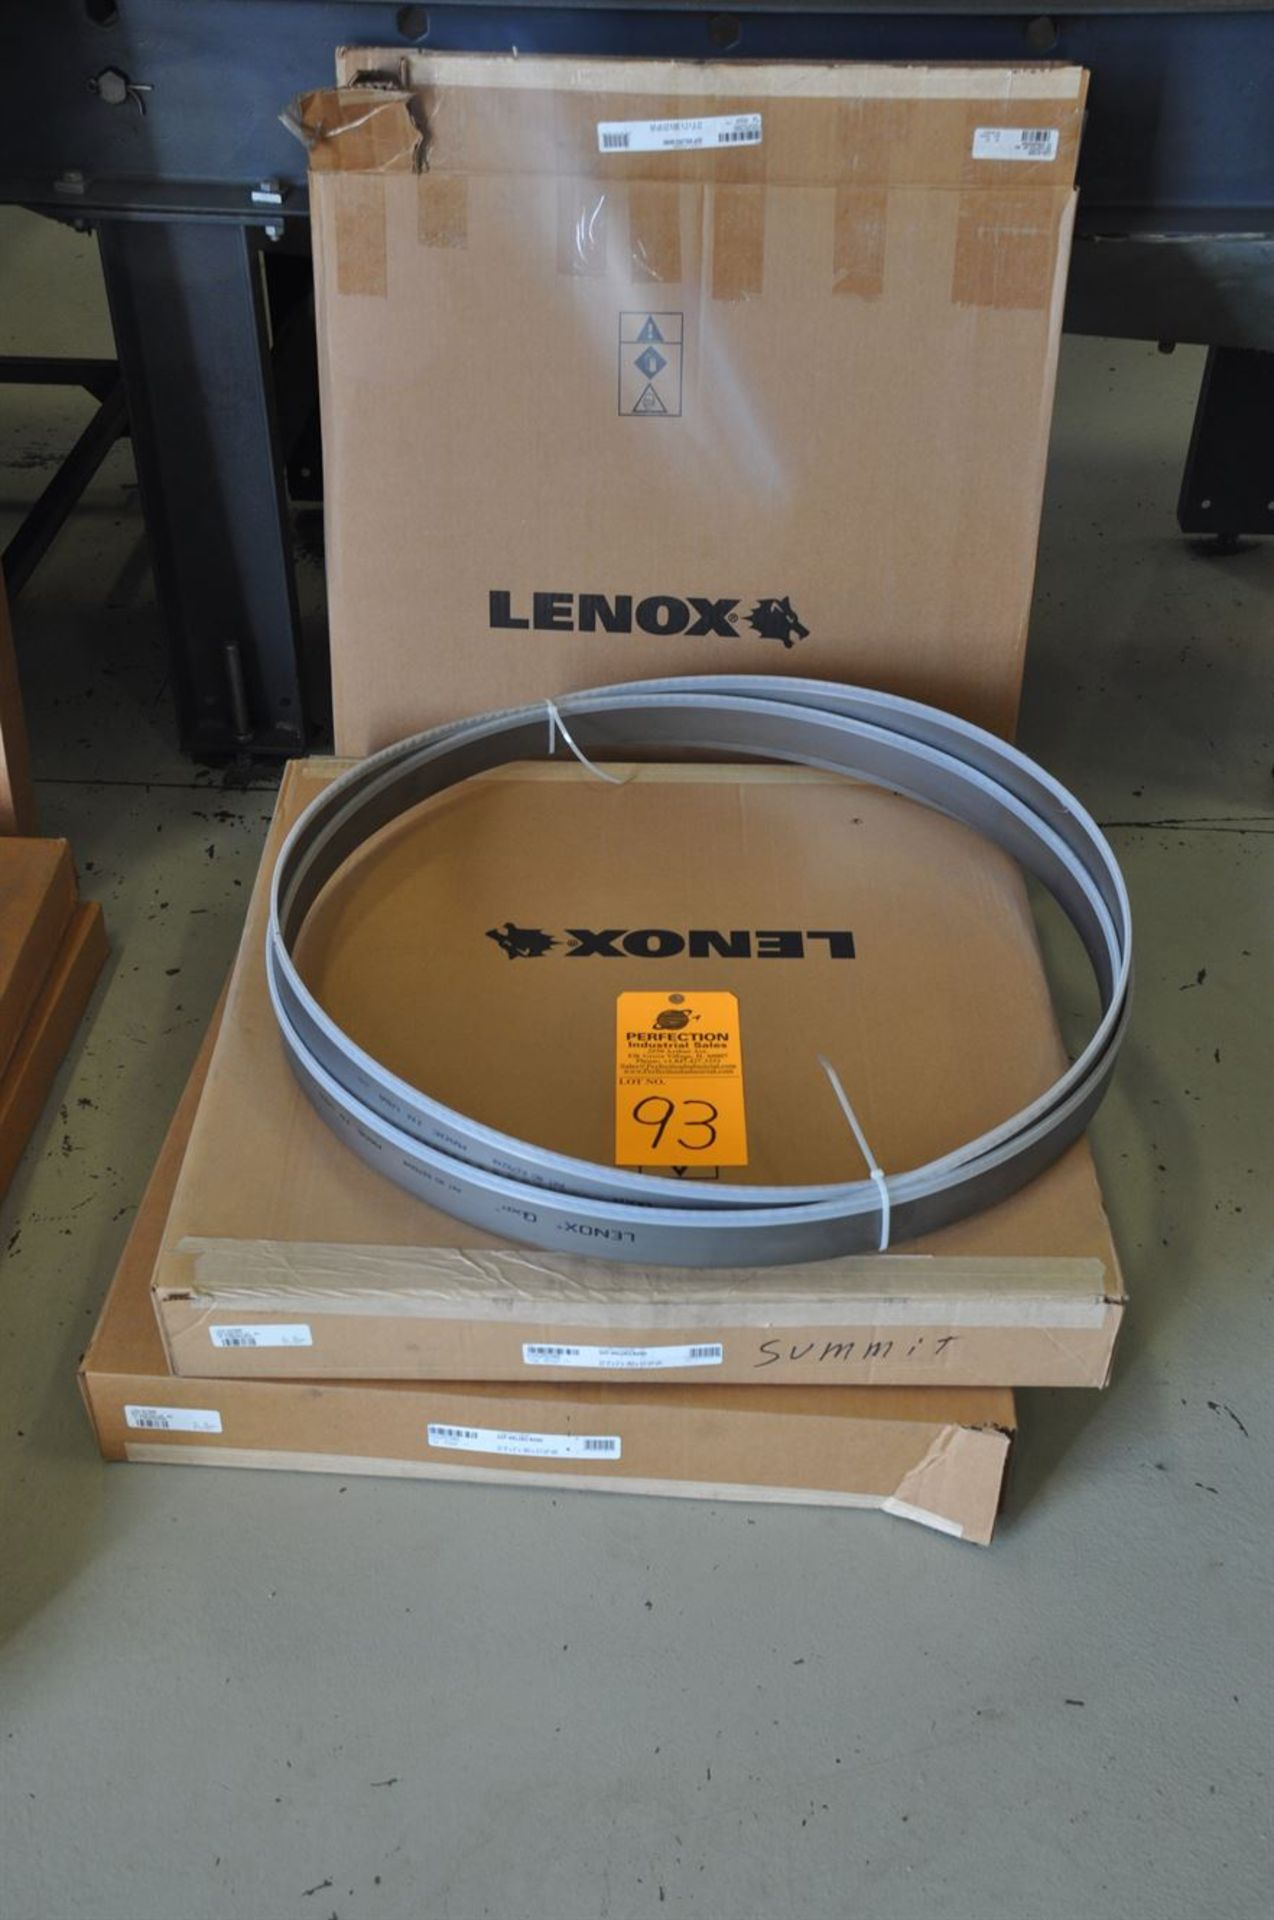 "Lenox (3) New Bandsaw Blades 22' 6"" x 2"" x .063 x 2/3 VP VR"